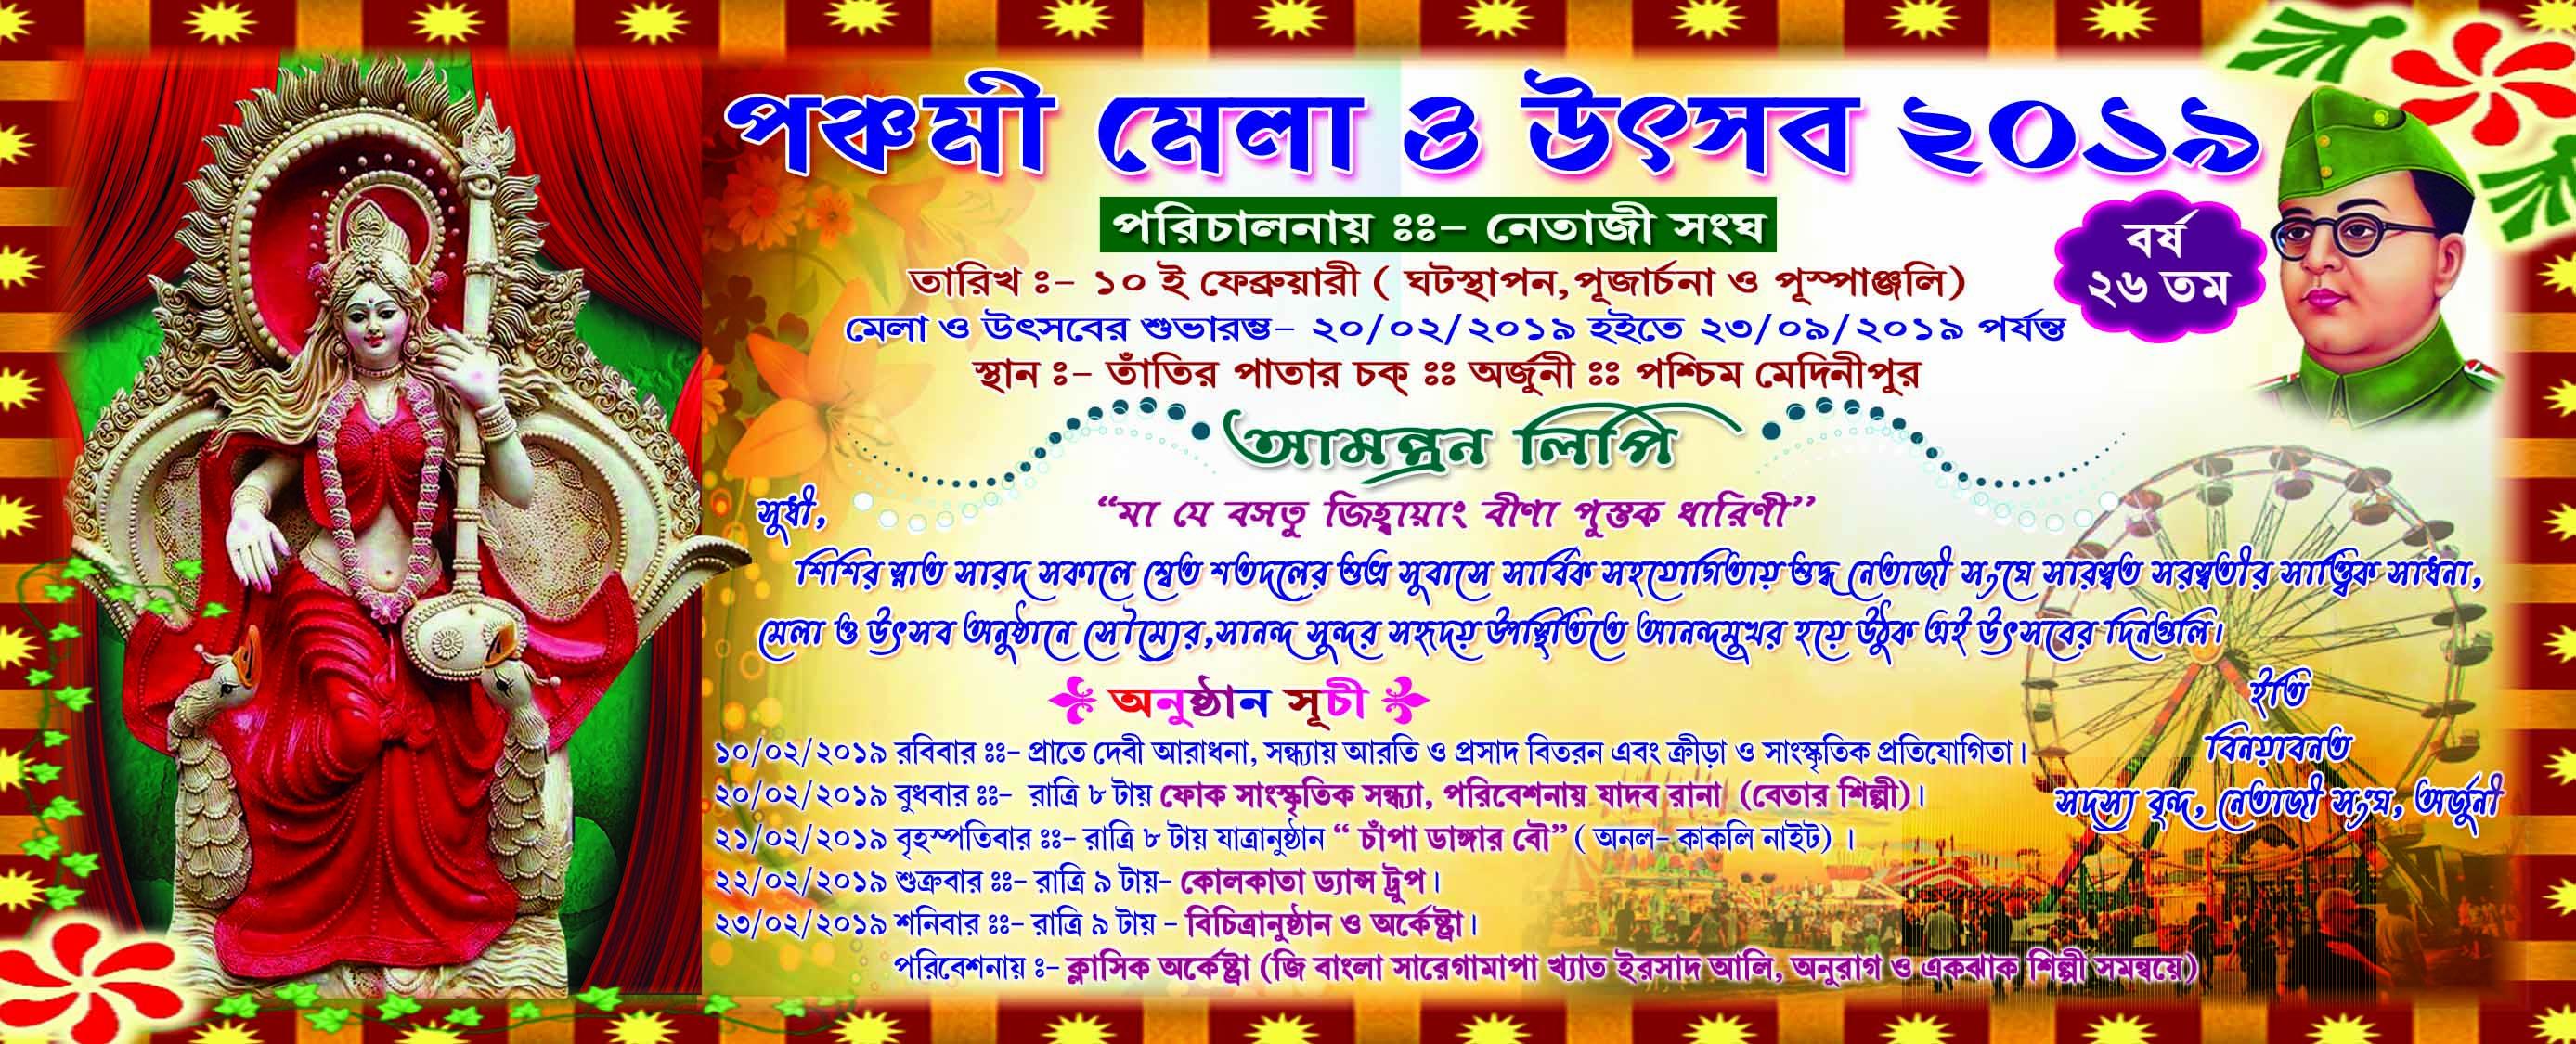 saraswati puja invitation card format